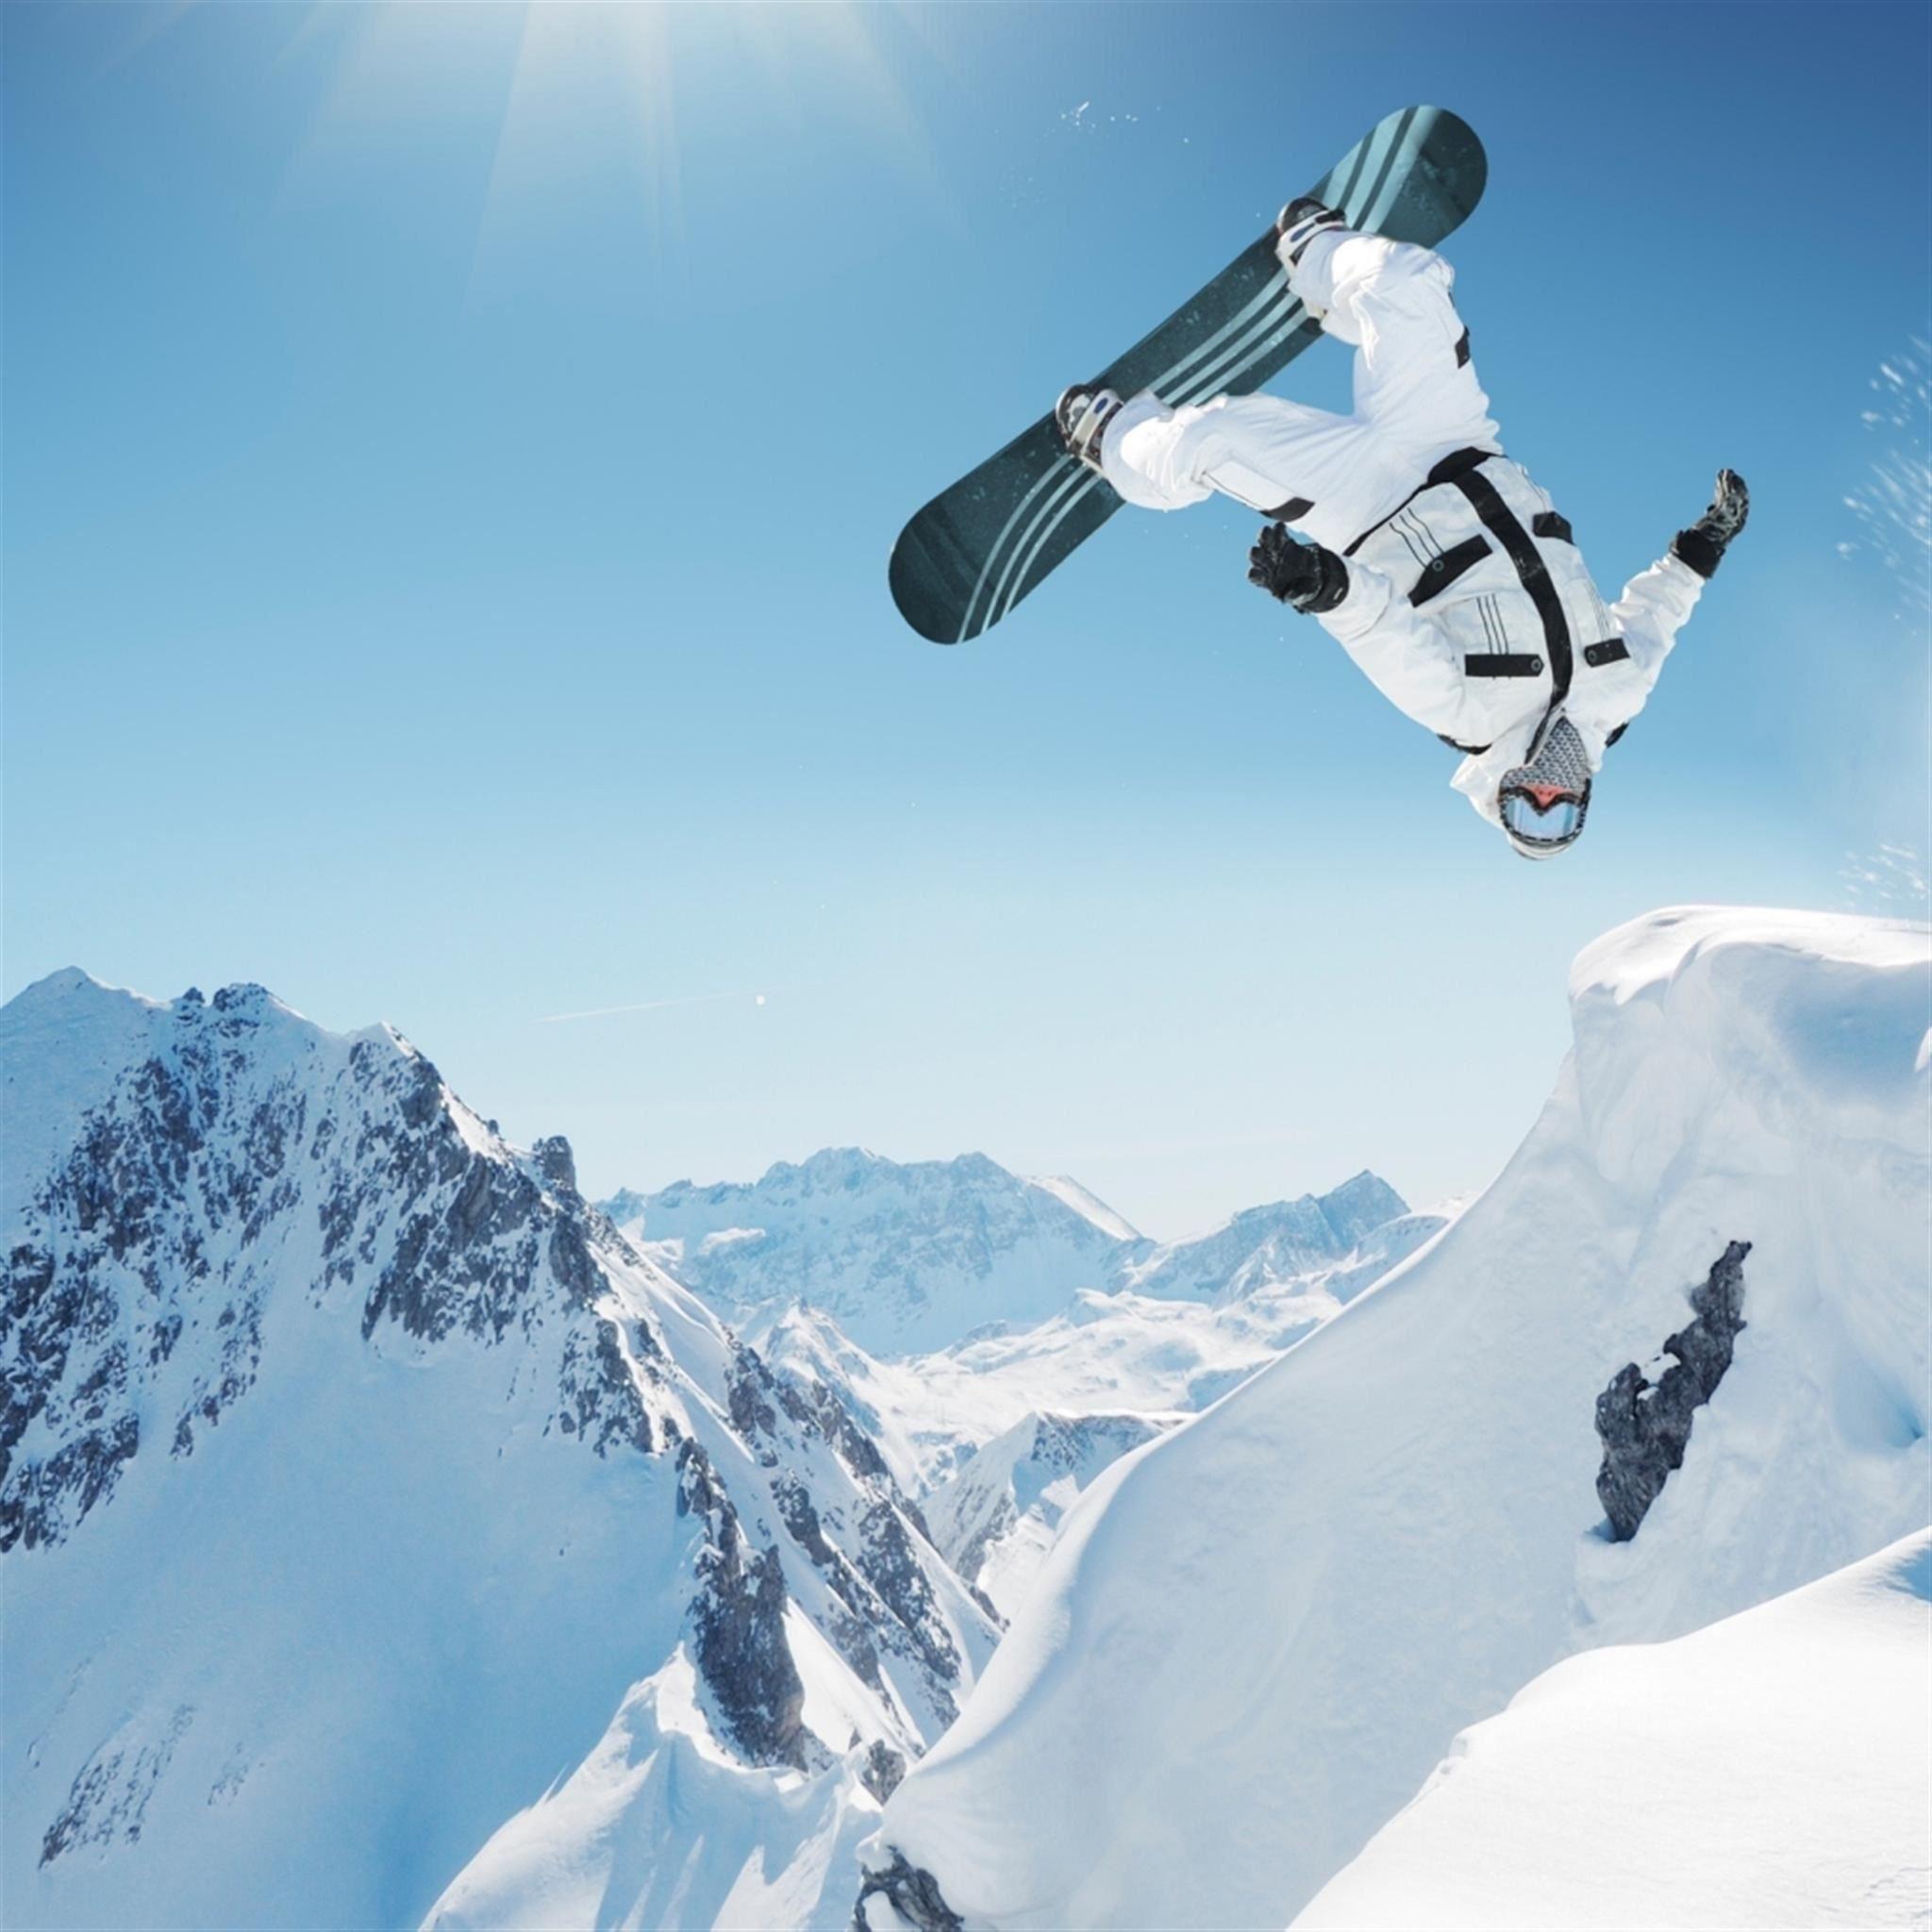 Ski Extreme Sports IPad Air Wallpaper Download